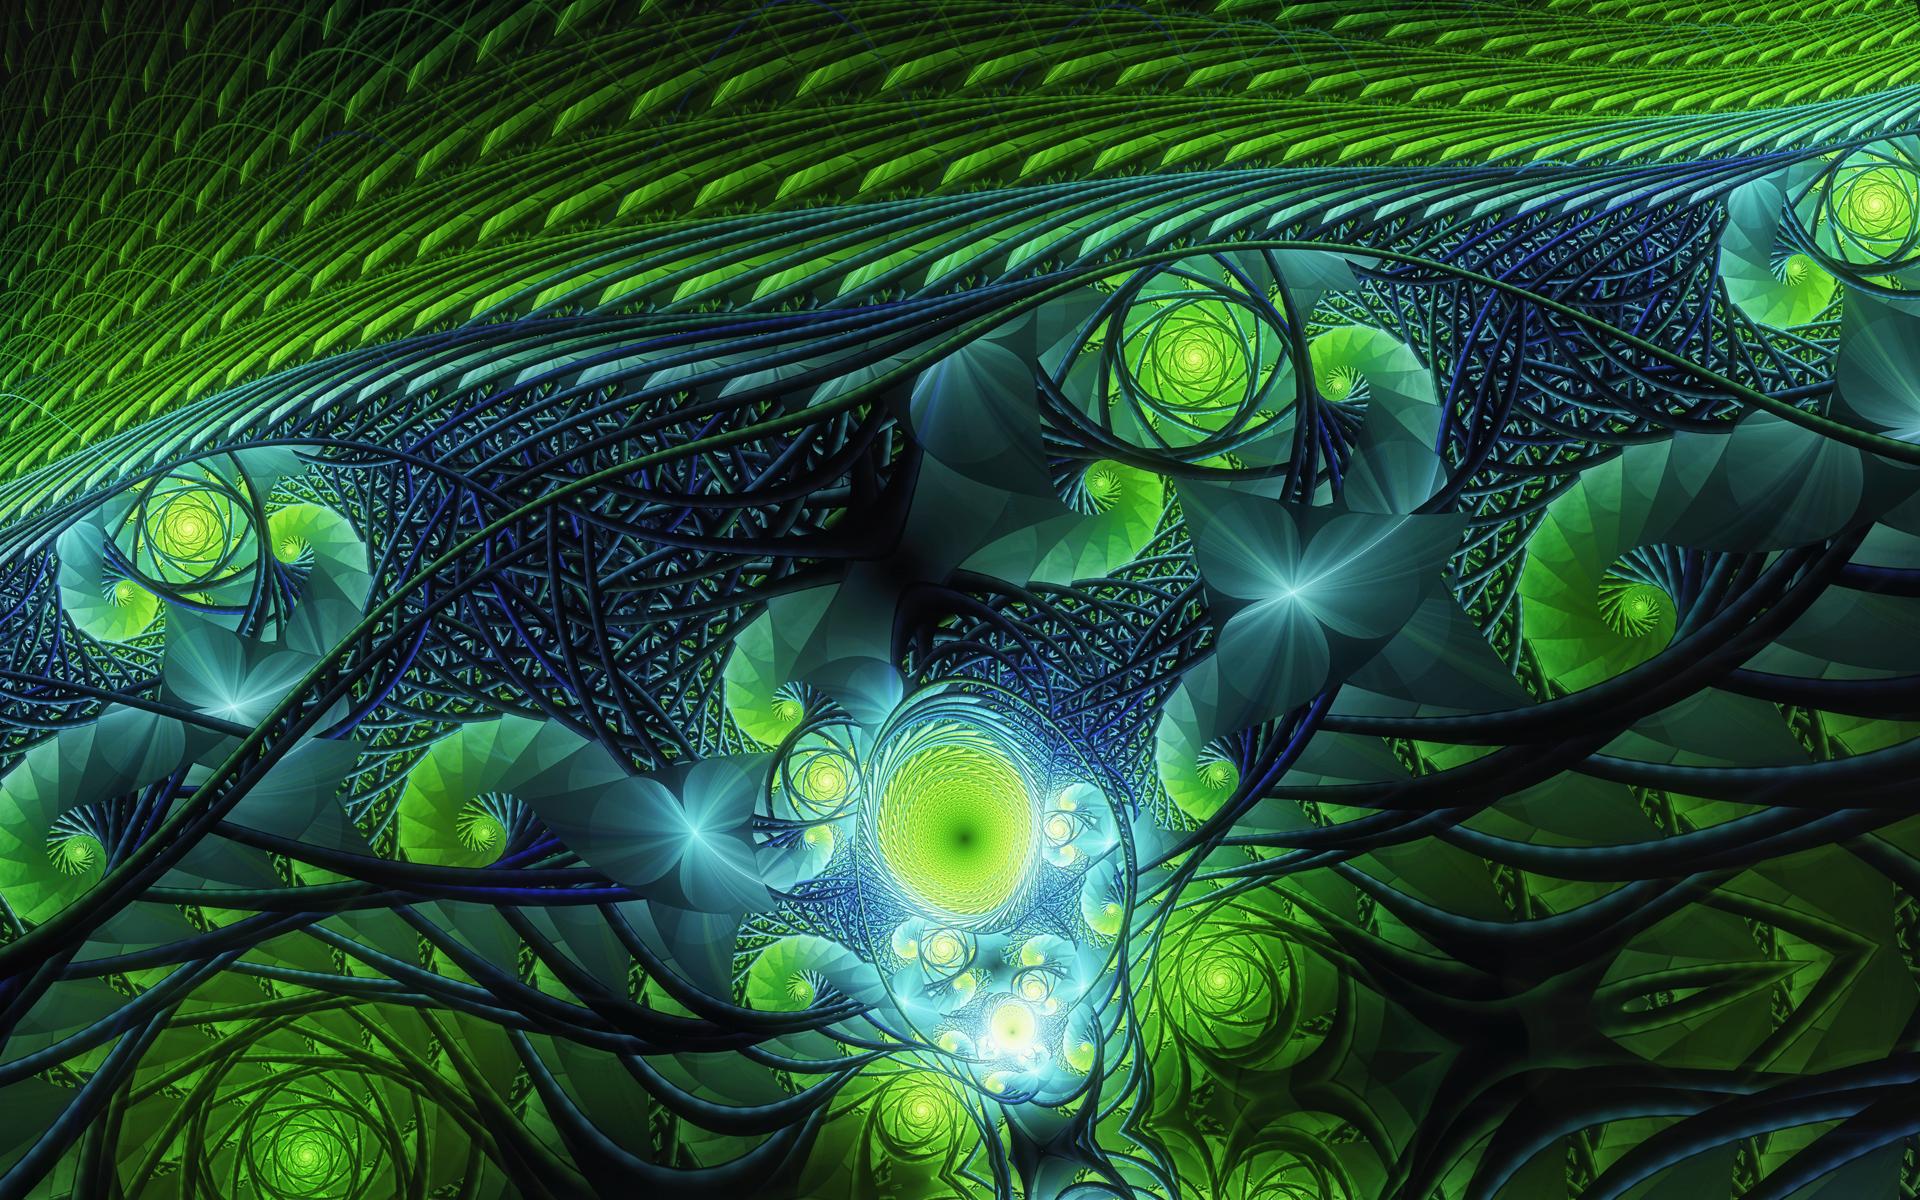 Tendrilscape by b33rheart